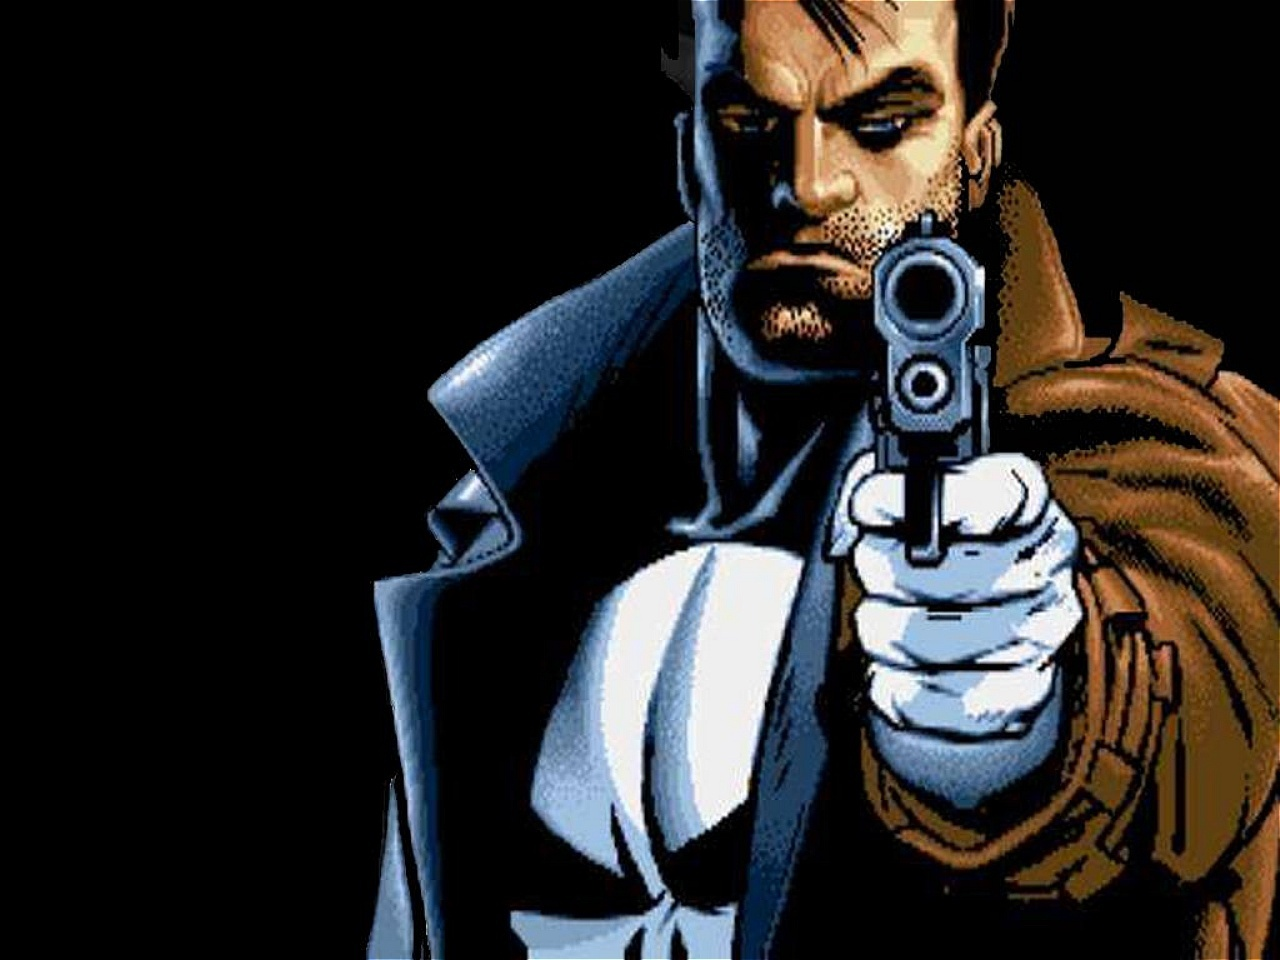 punisherakartsky   The Punisher Wallpaper 6967485 1280x960